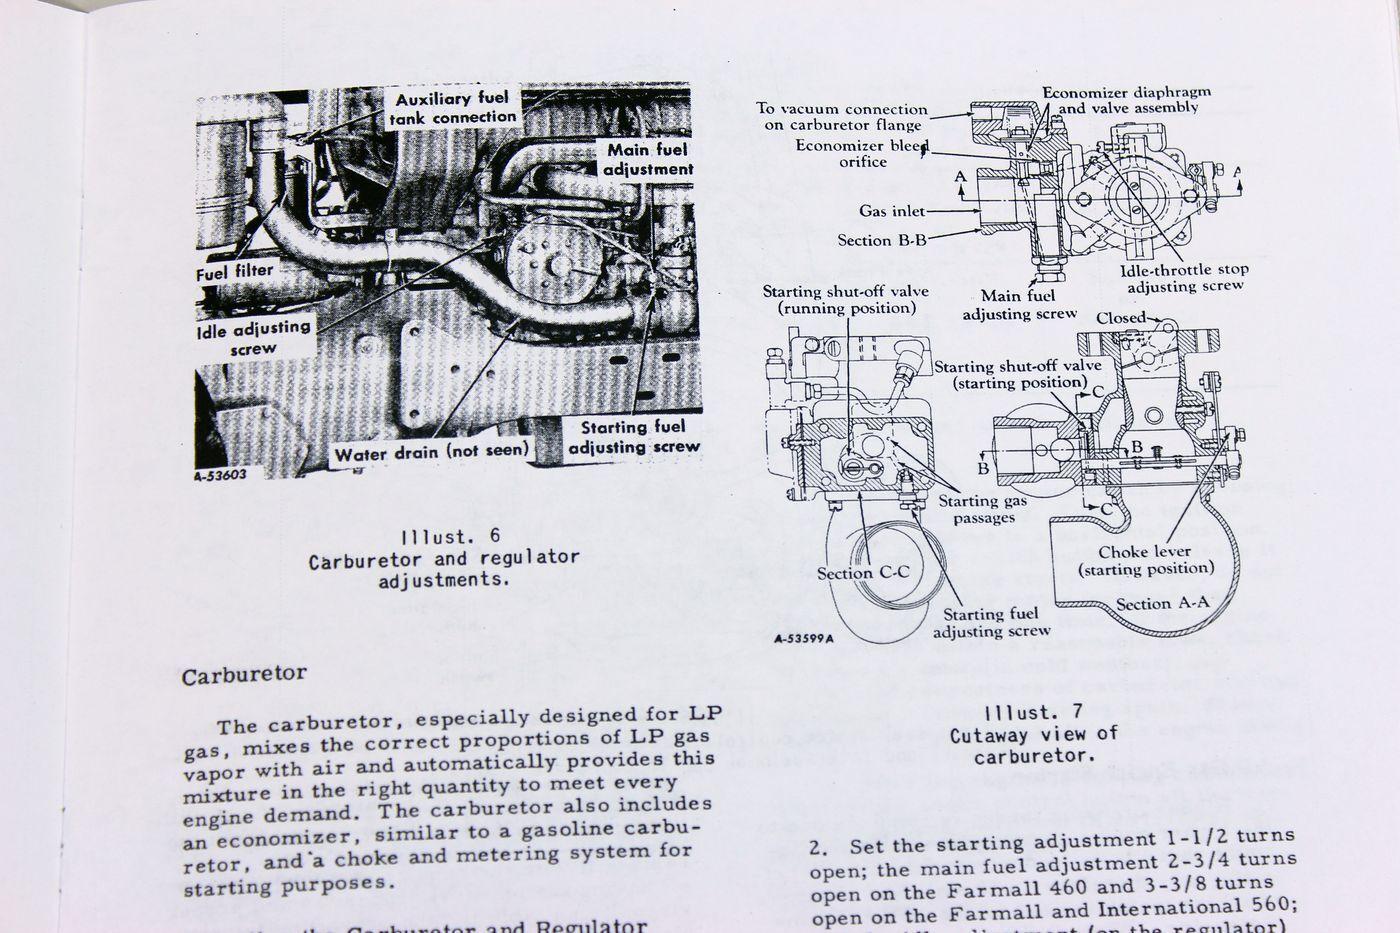 International Farmall 460 560 LP Tractor Owner Operators Manual LPG on